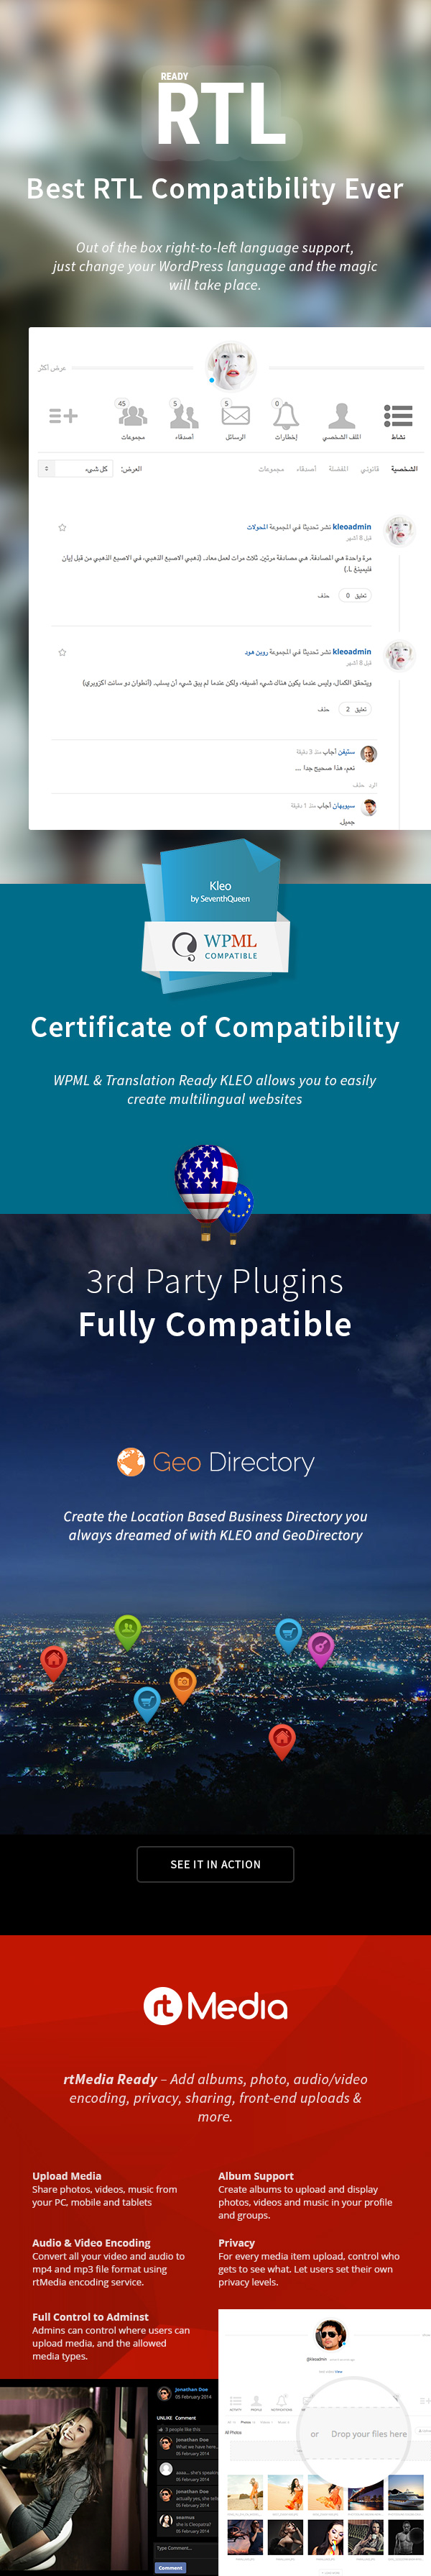 KLEO - Pro Community Focused, Multi-Purpose BuddyPress Theme - 19